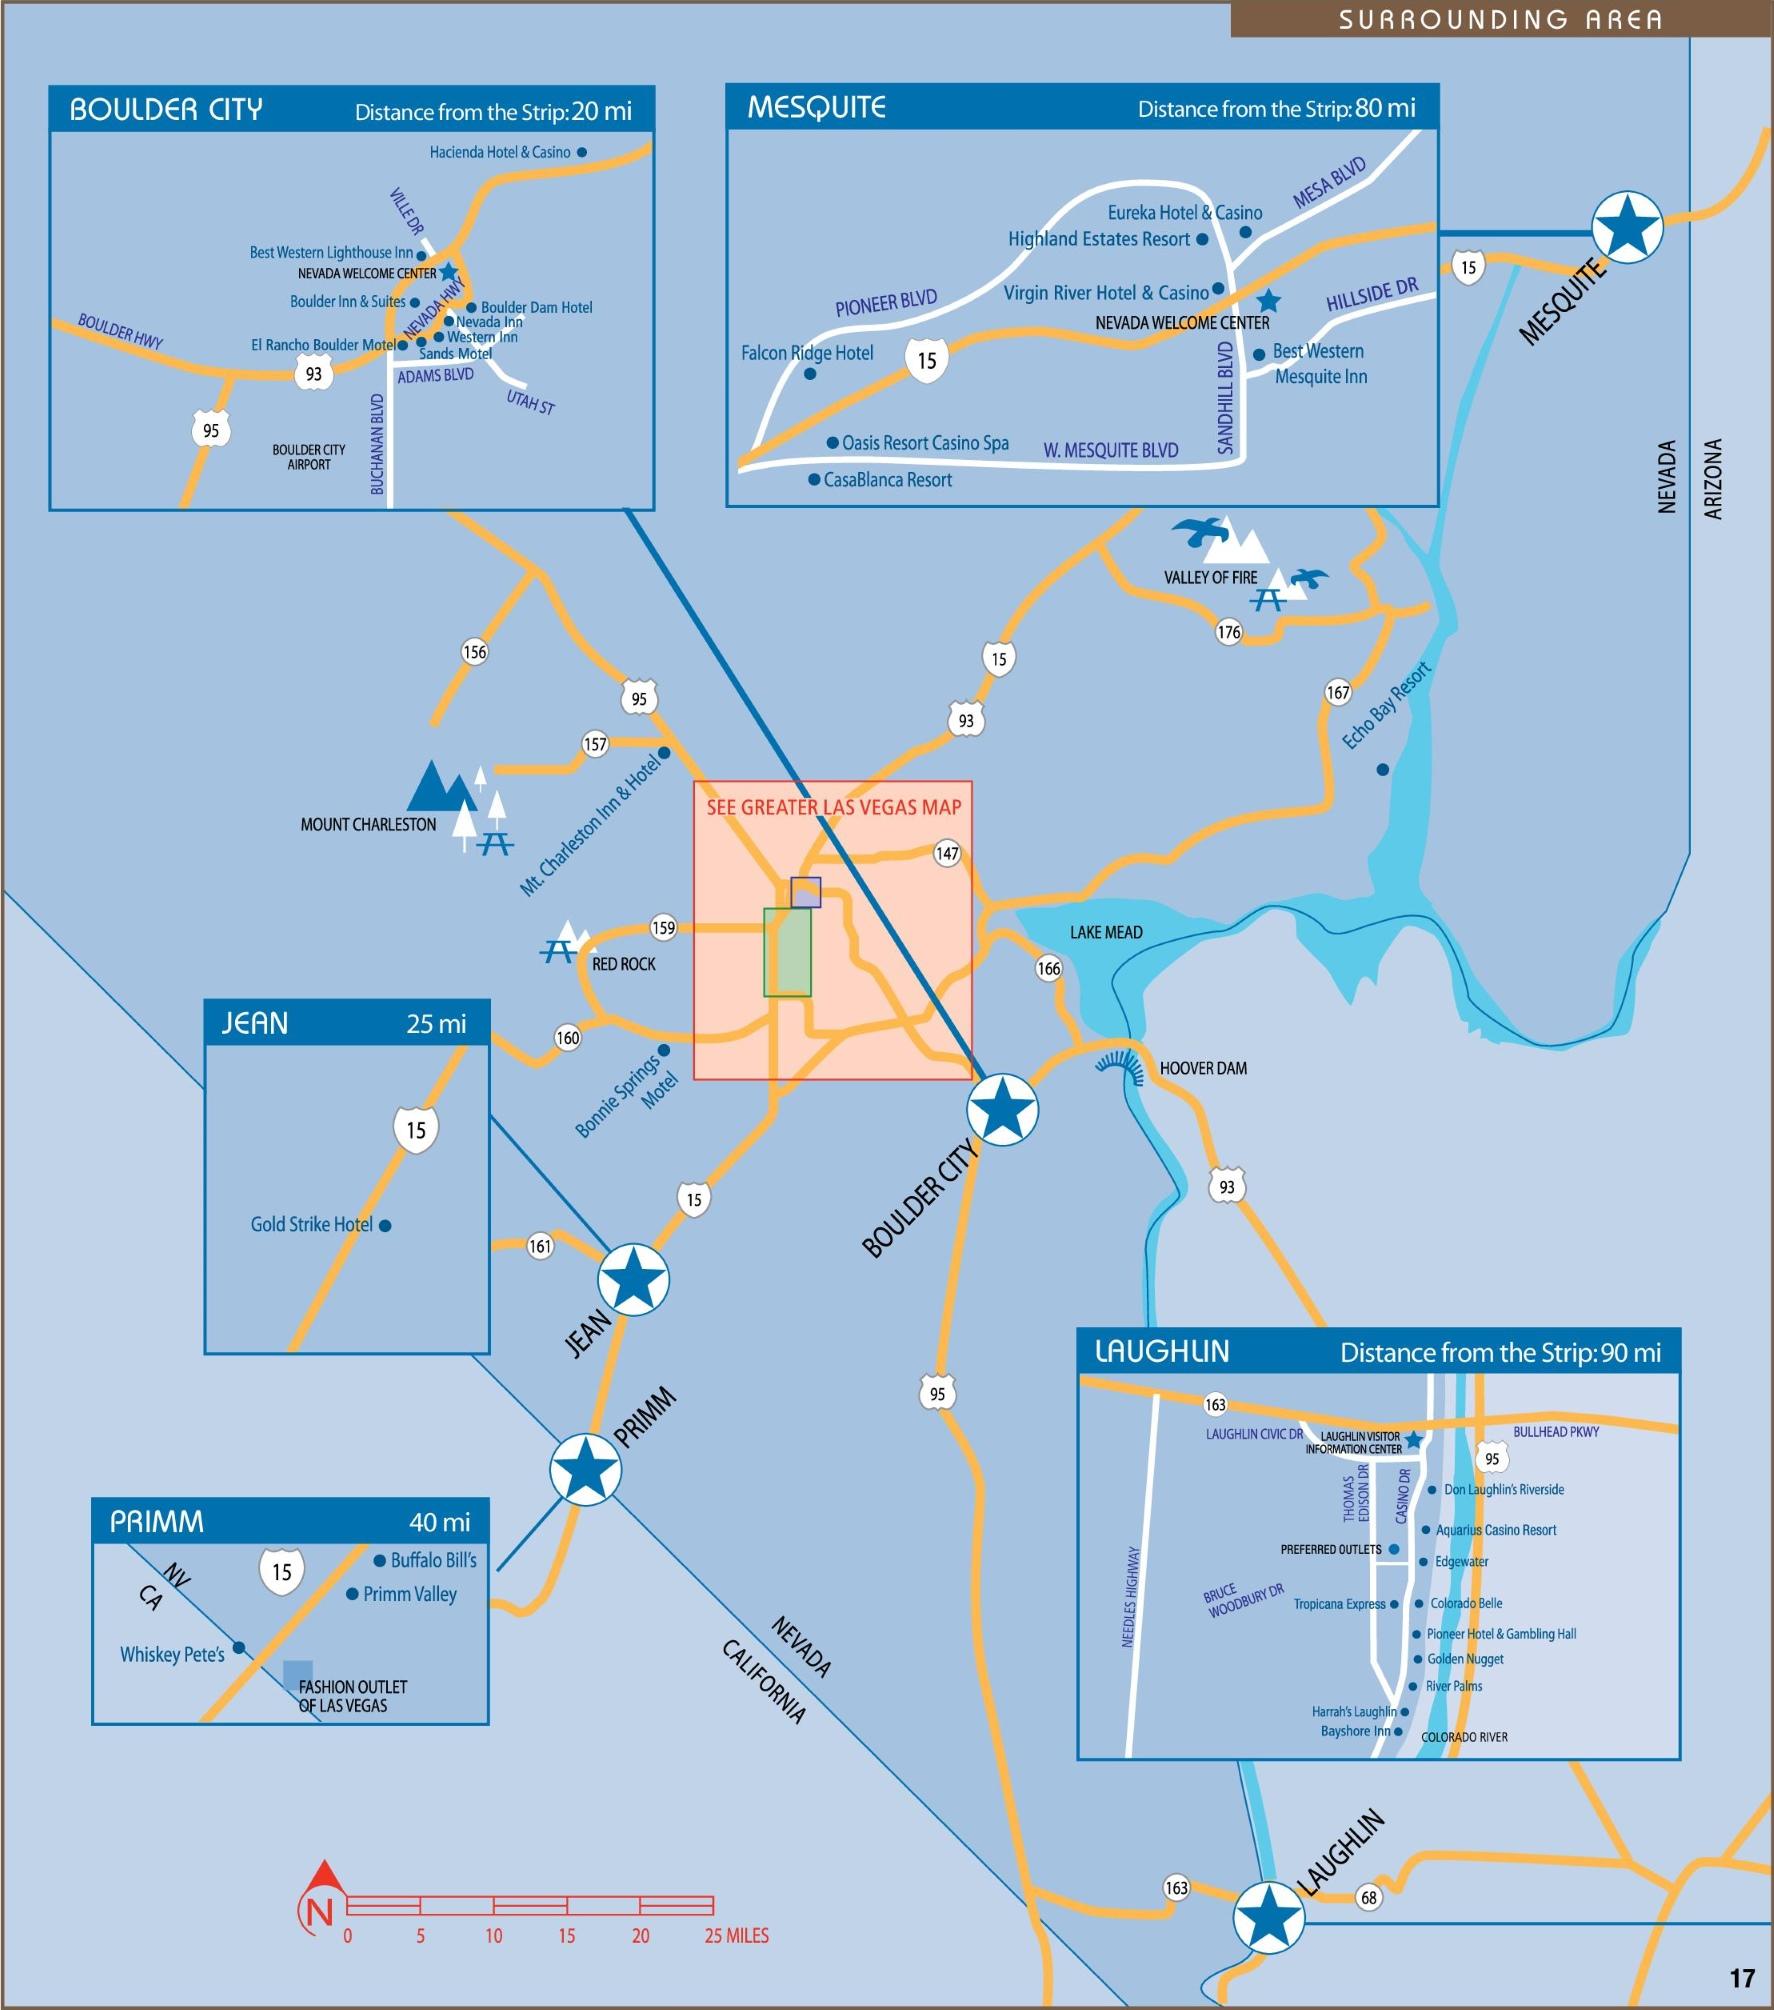 Las Vegas Maps | U.S. | Maps of Las Vegas Strip